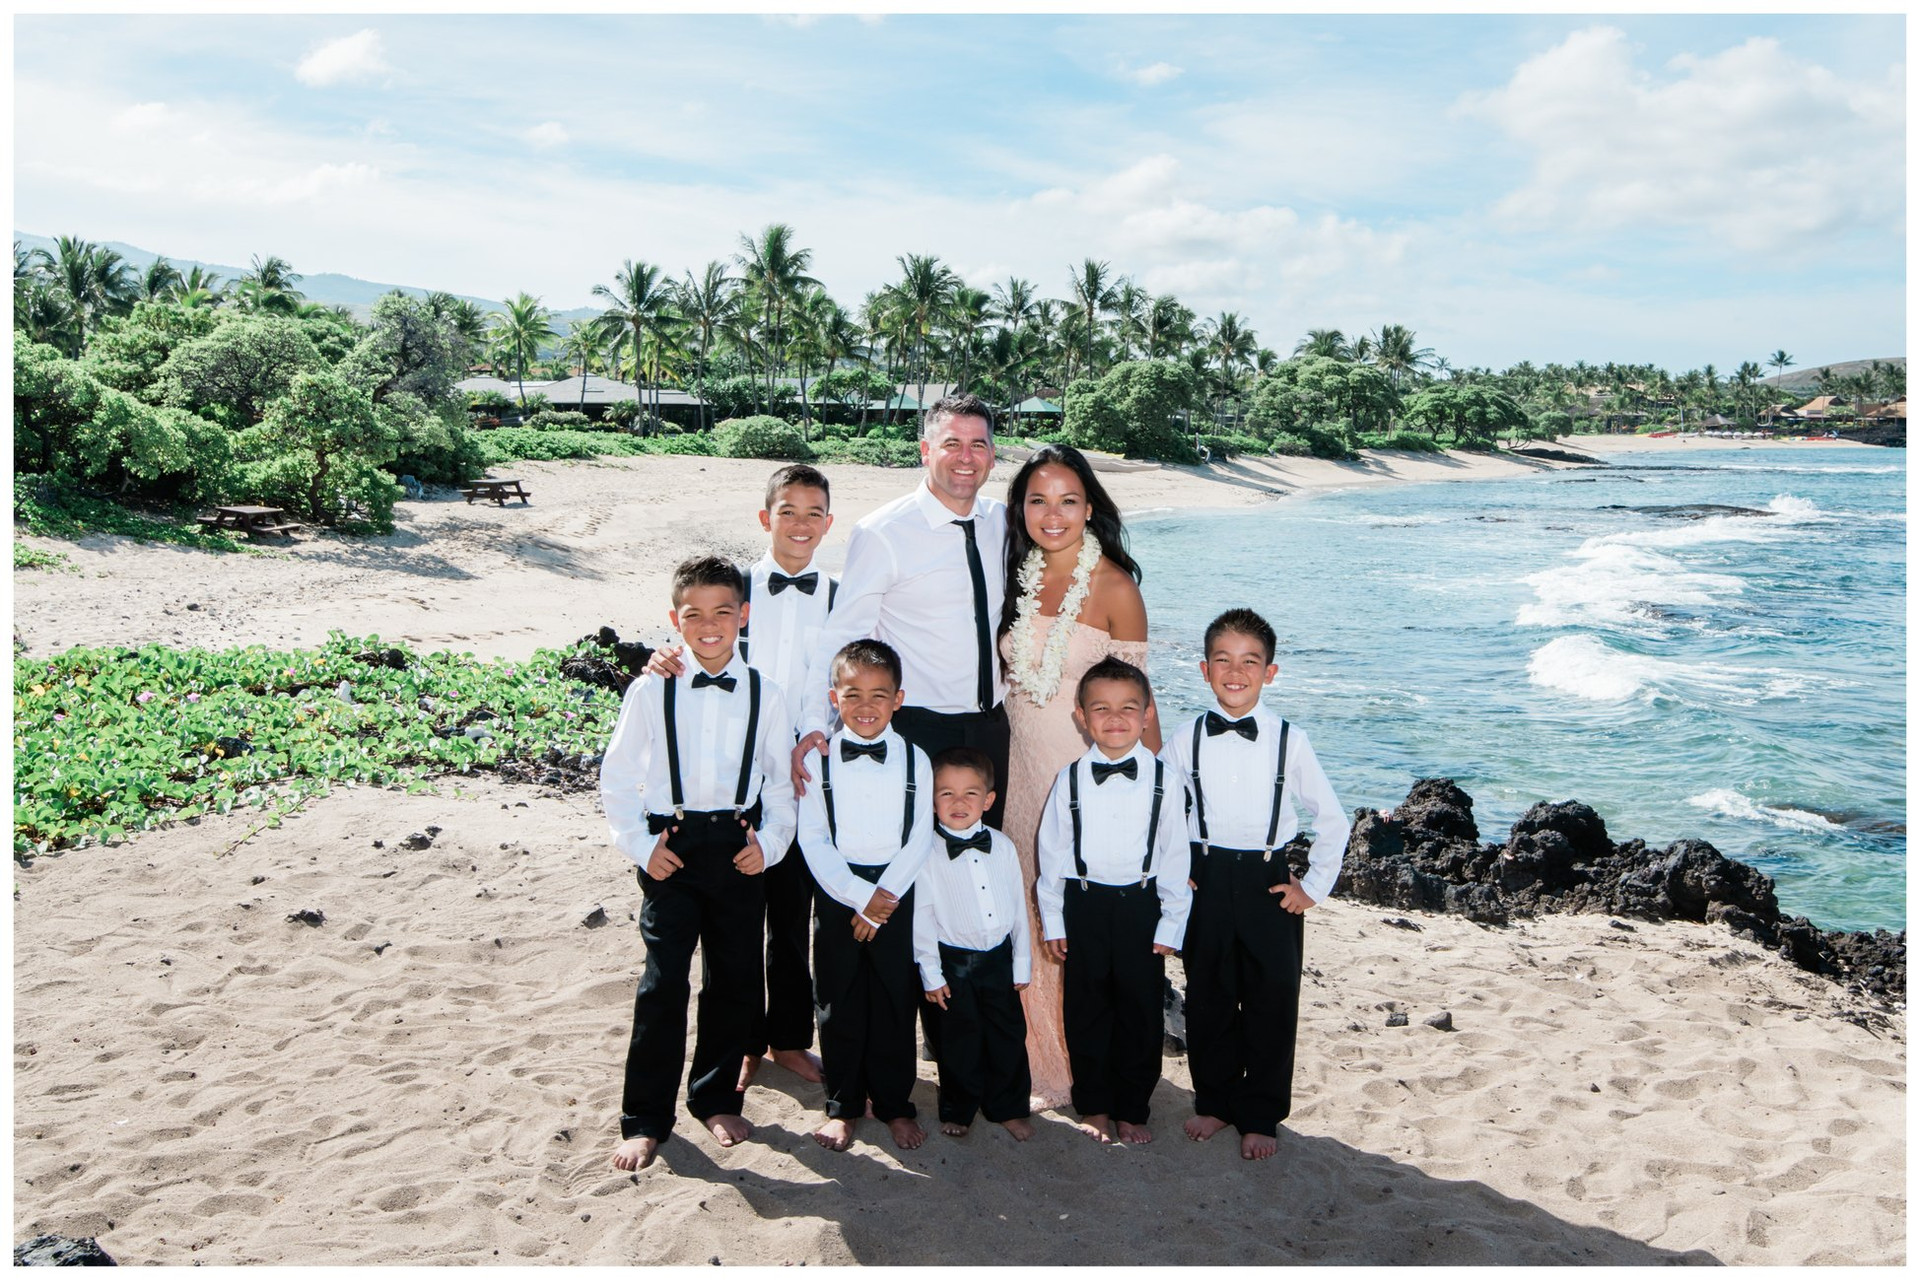 Kona Family Photos 5.jpg